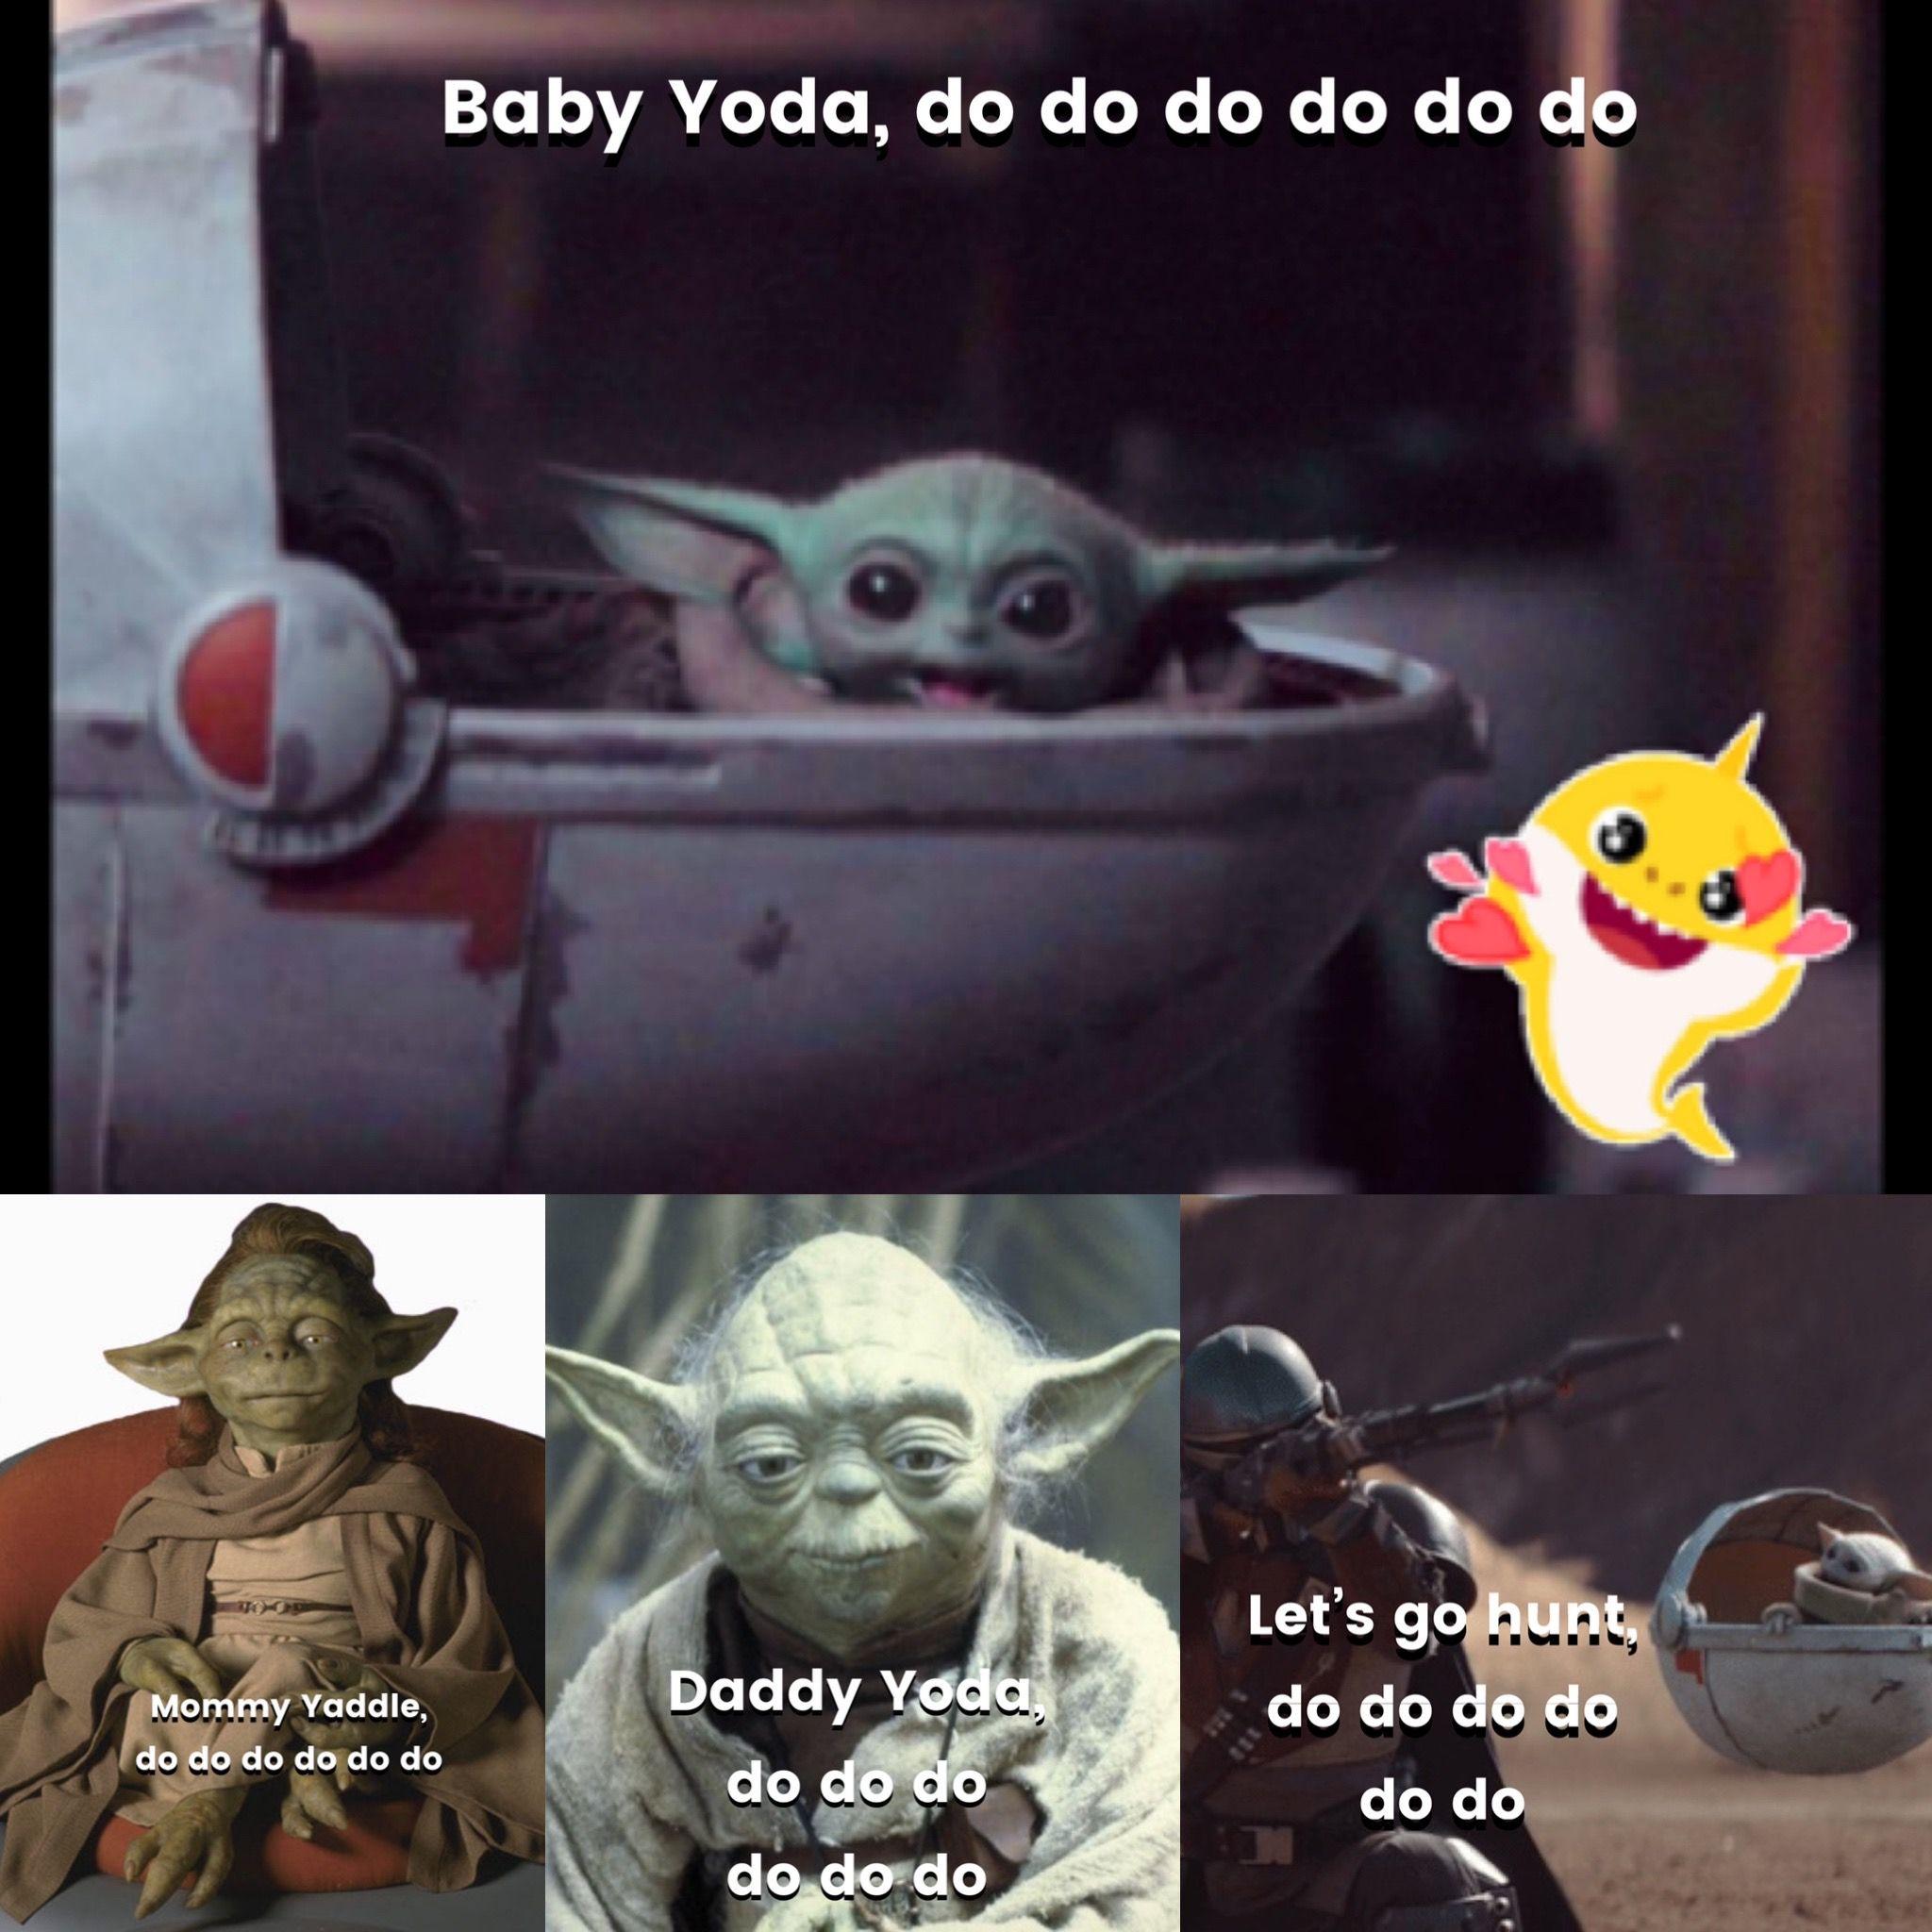 Baby Yoda Do Do Do Do Do Do Babyyoda Babyshark Yoda Starwars Mandalorian Disneyplus Yoda Funny Star Wars Memes Star Wars Fandom